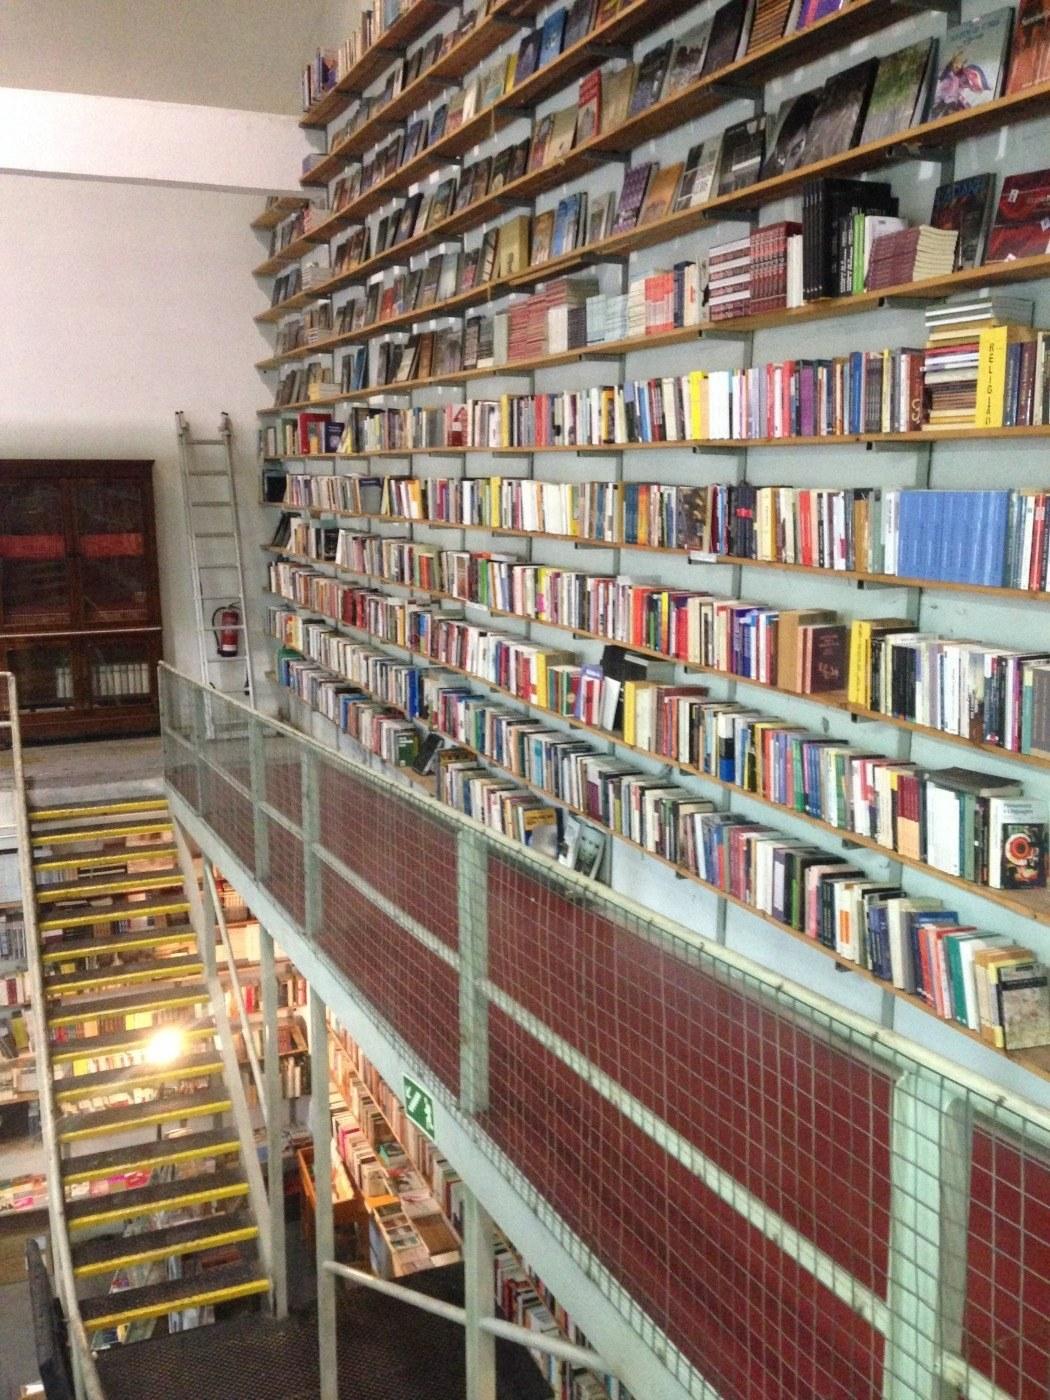 Livraria Ler Devagar bookstore Lisbon